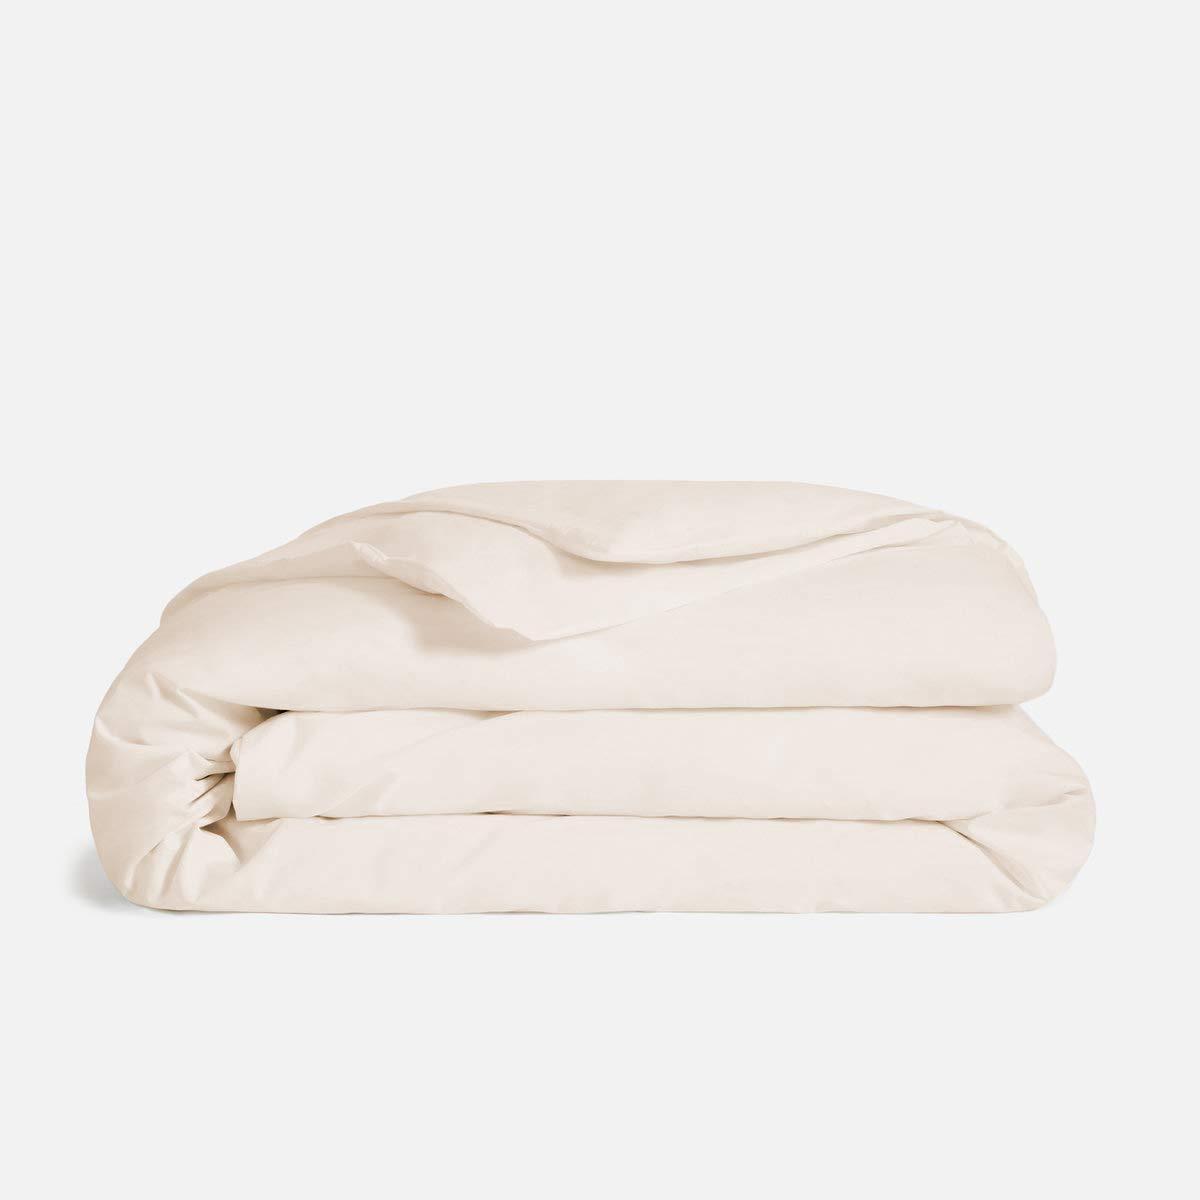 Fits Mattress Upto 18 Deep Pocket Soft Cotton Bed Sheets and Pillowcases Fits Mattress Upto 18/'/' Deep Pocket Teal Long-Staple Cotton Queen Sheets Sateen Weave Mayfair Linen 600 Thread Count 100/% Cotton Sheets